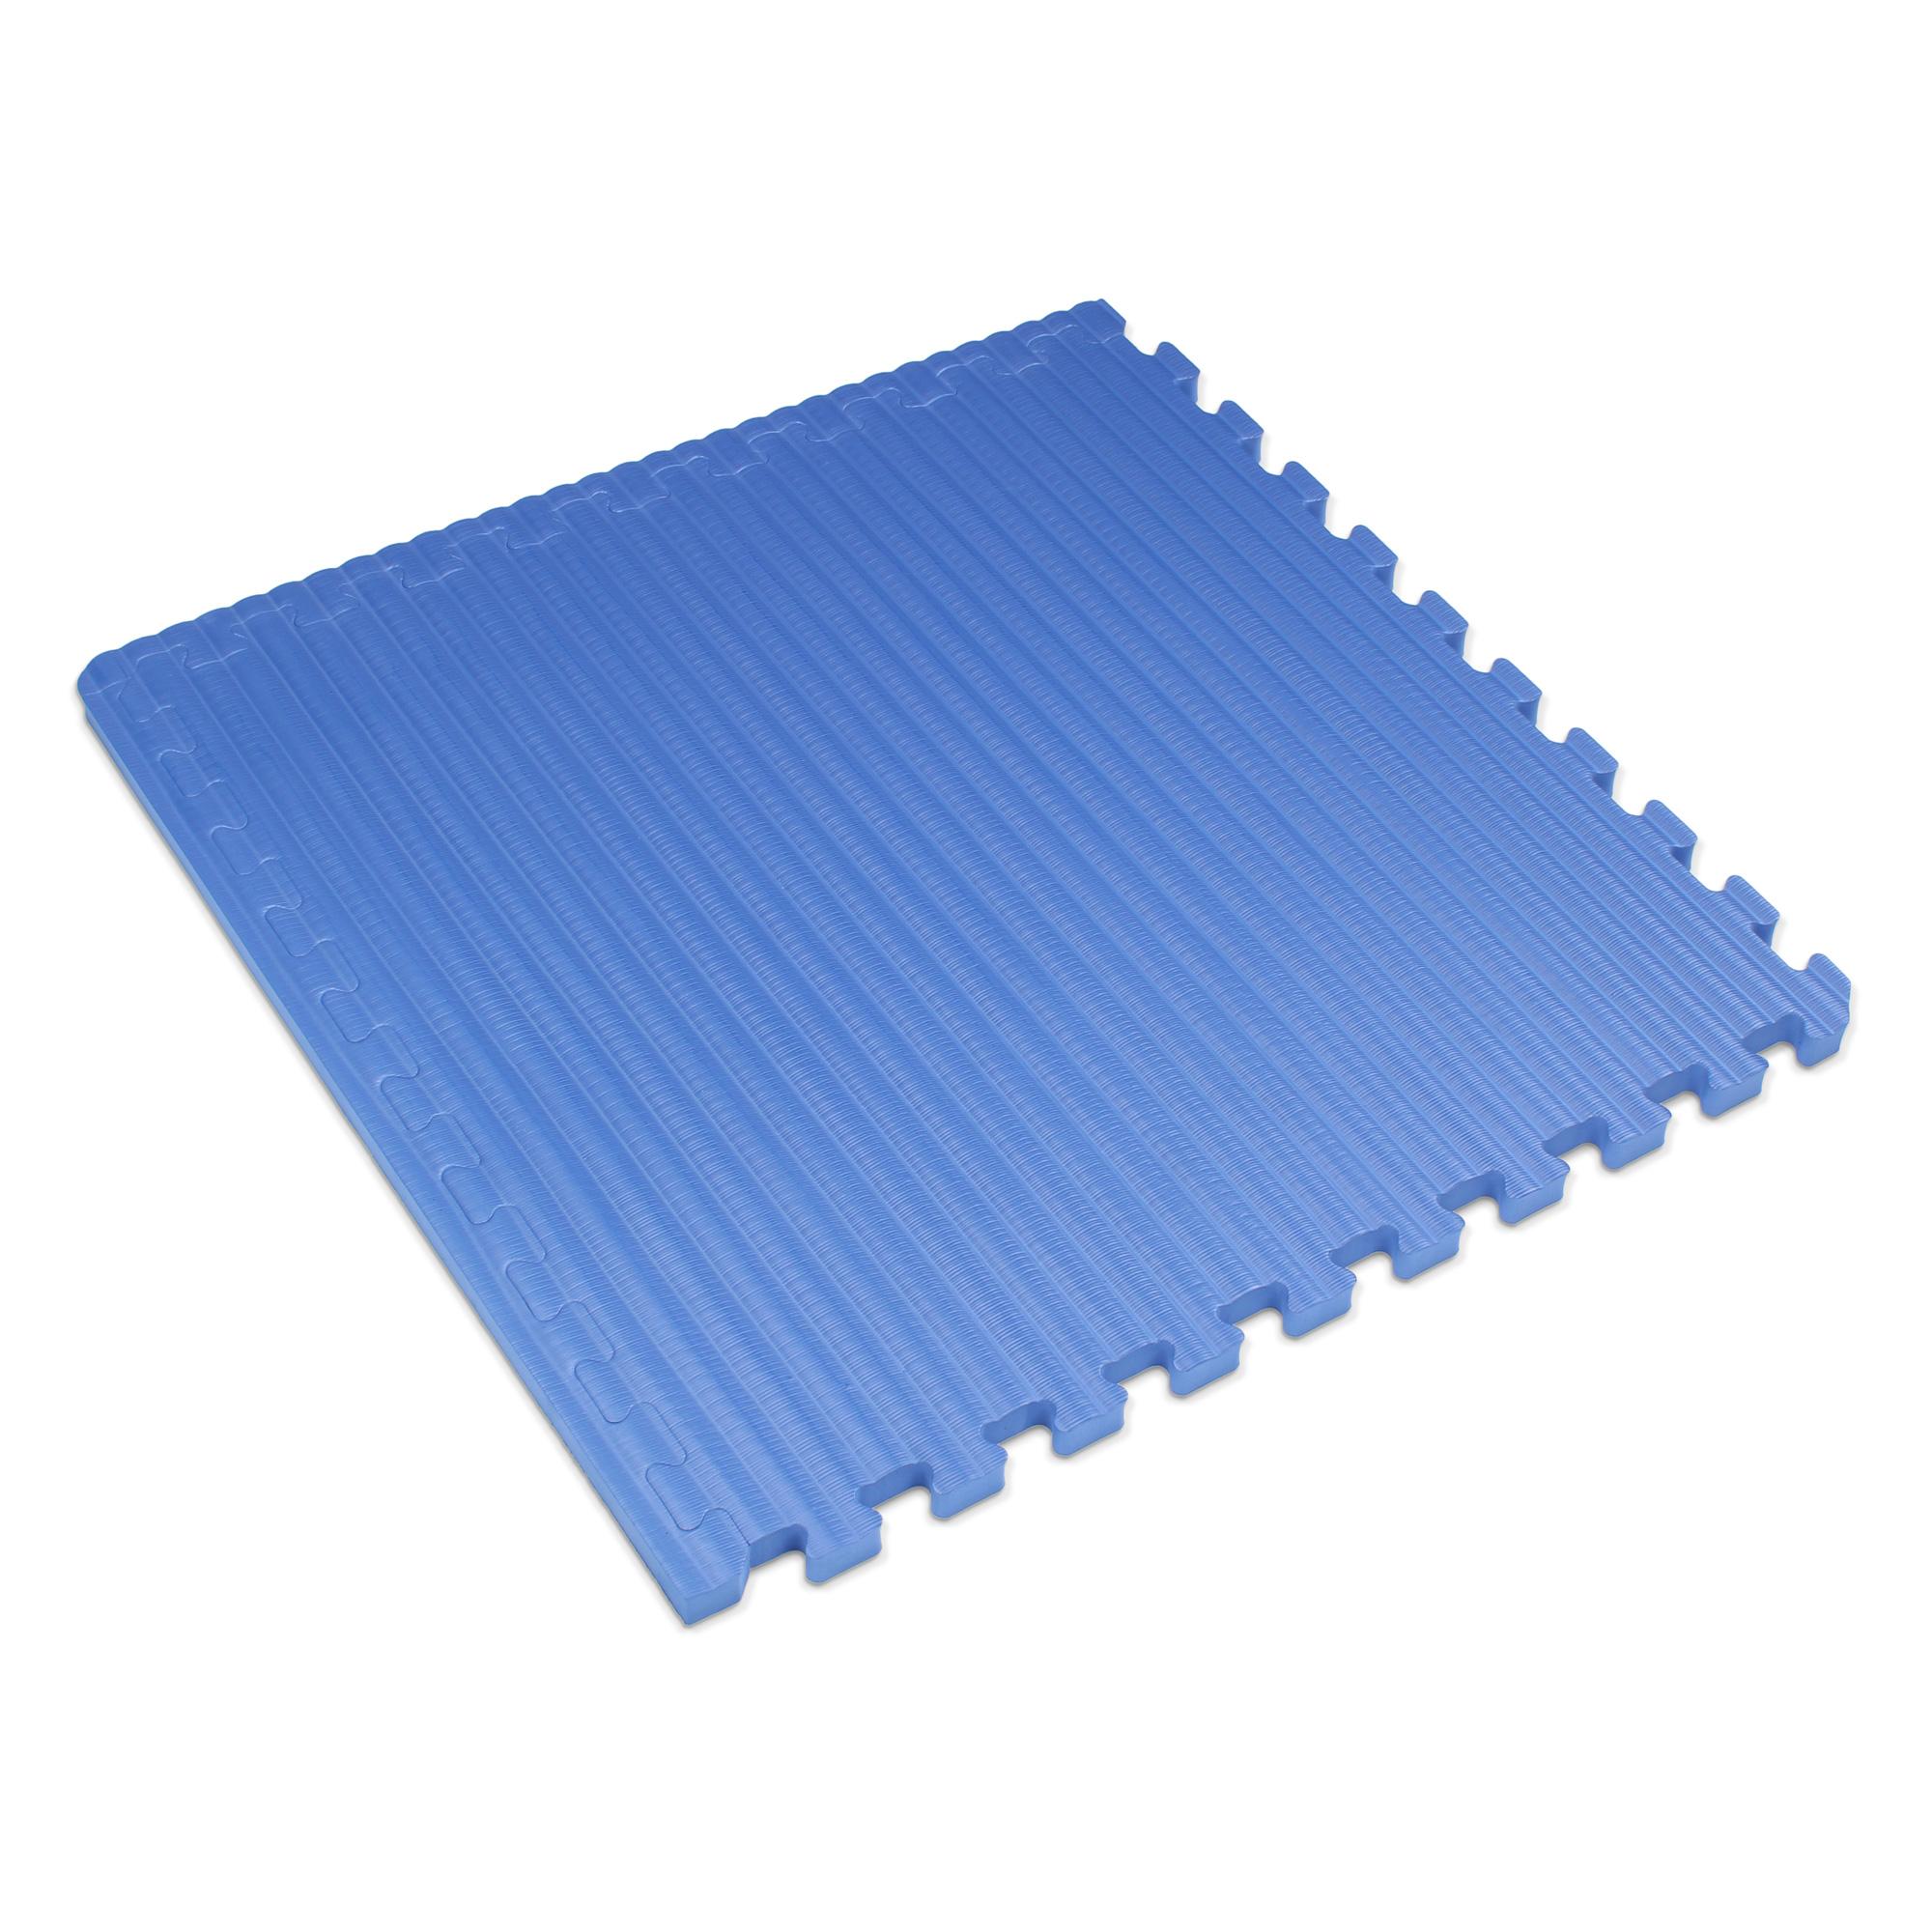 "We Sell Mats 3/4"" Thick Interlocking Foam Tatami Martial Arts Mats, 16 Sq Ft (4 Tiles), Charcoal Gray"